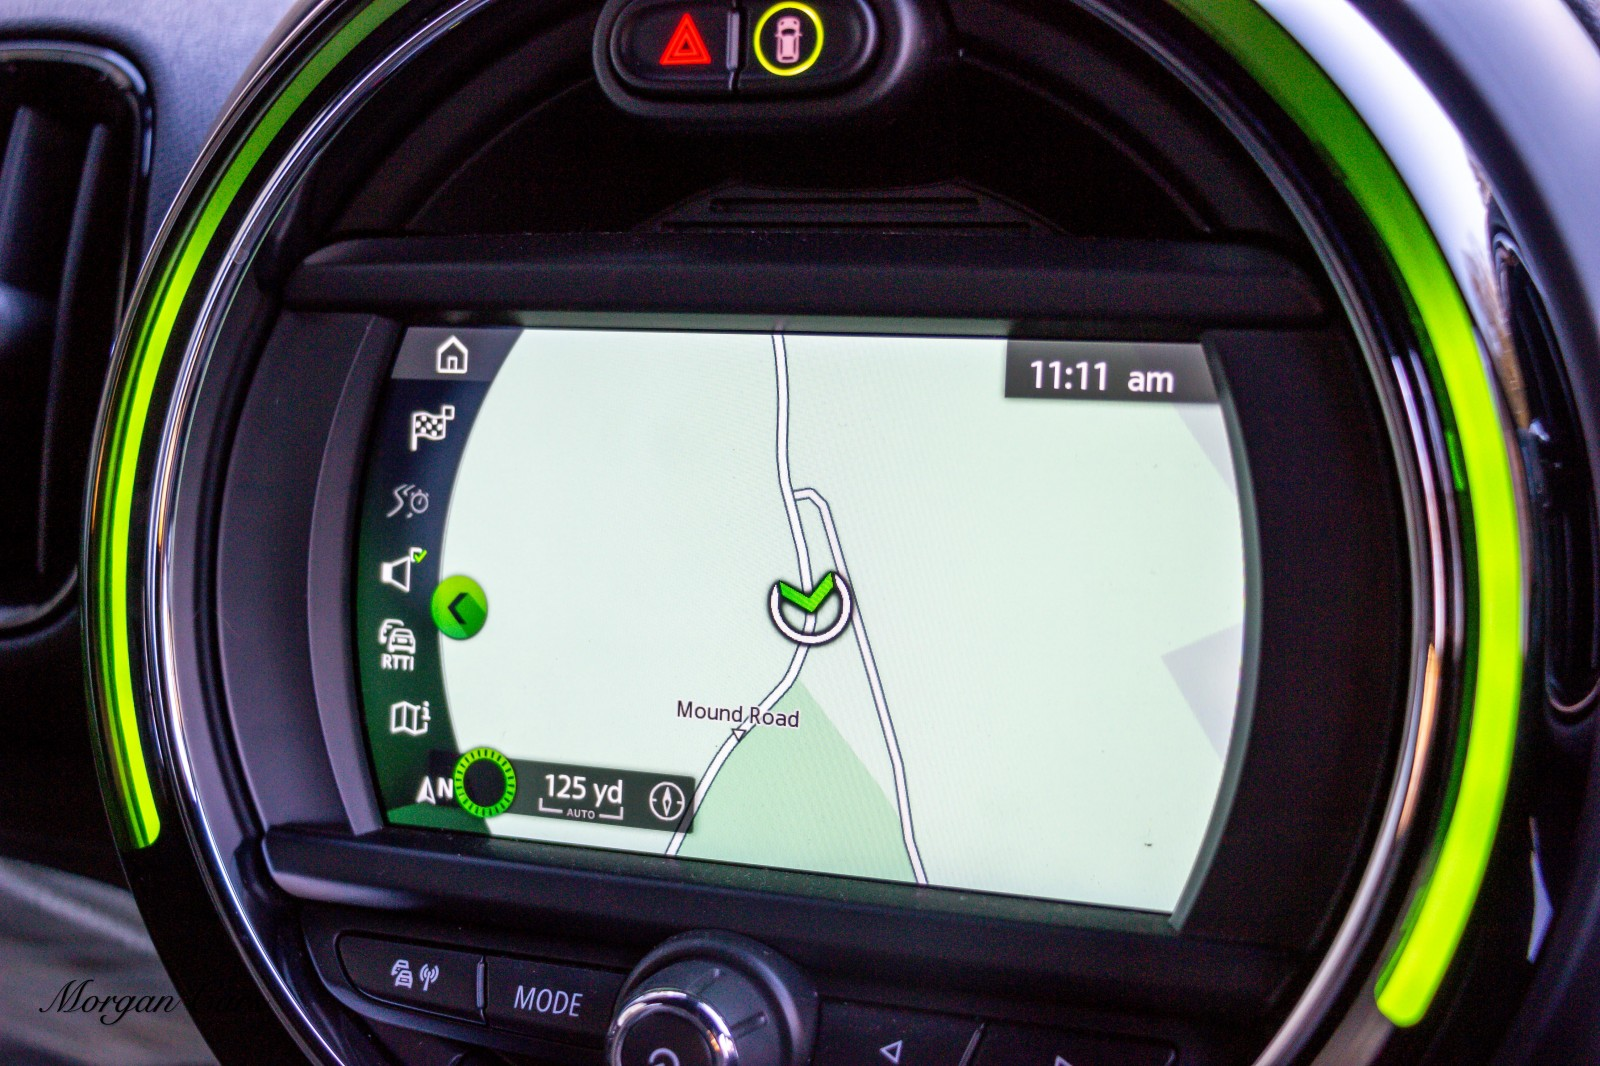 2019 MINI Countryman COOPER SE SPORT ALL4 PHEV Hybrid Automatic – Morgan Cars 9 Mound Road, Warrenpoint, Newry BT34 3LW, UK full